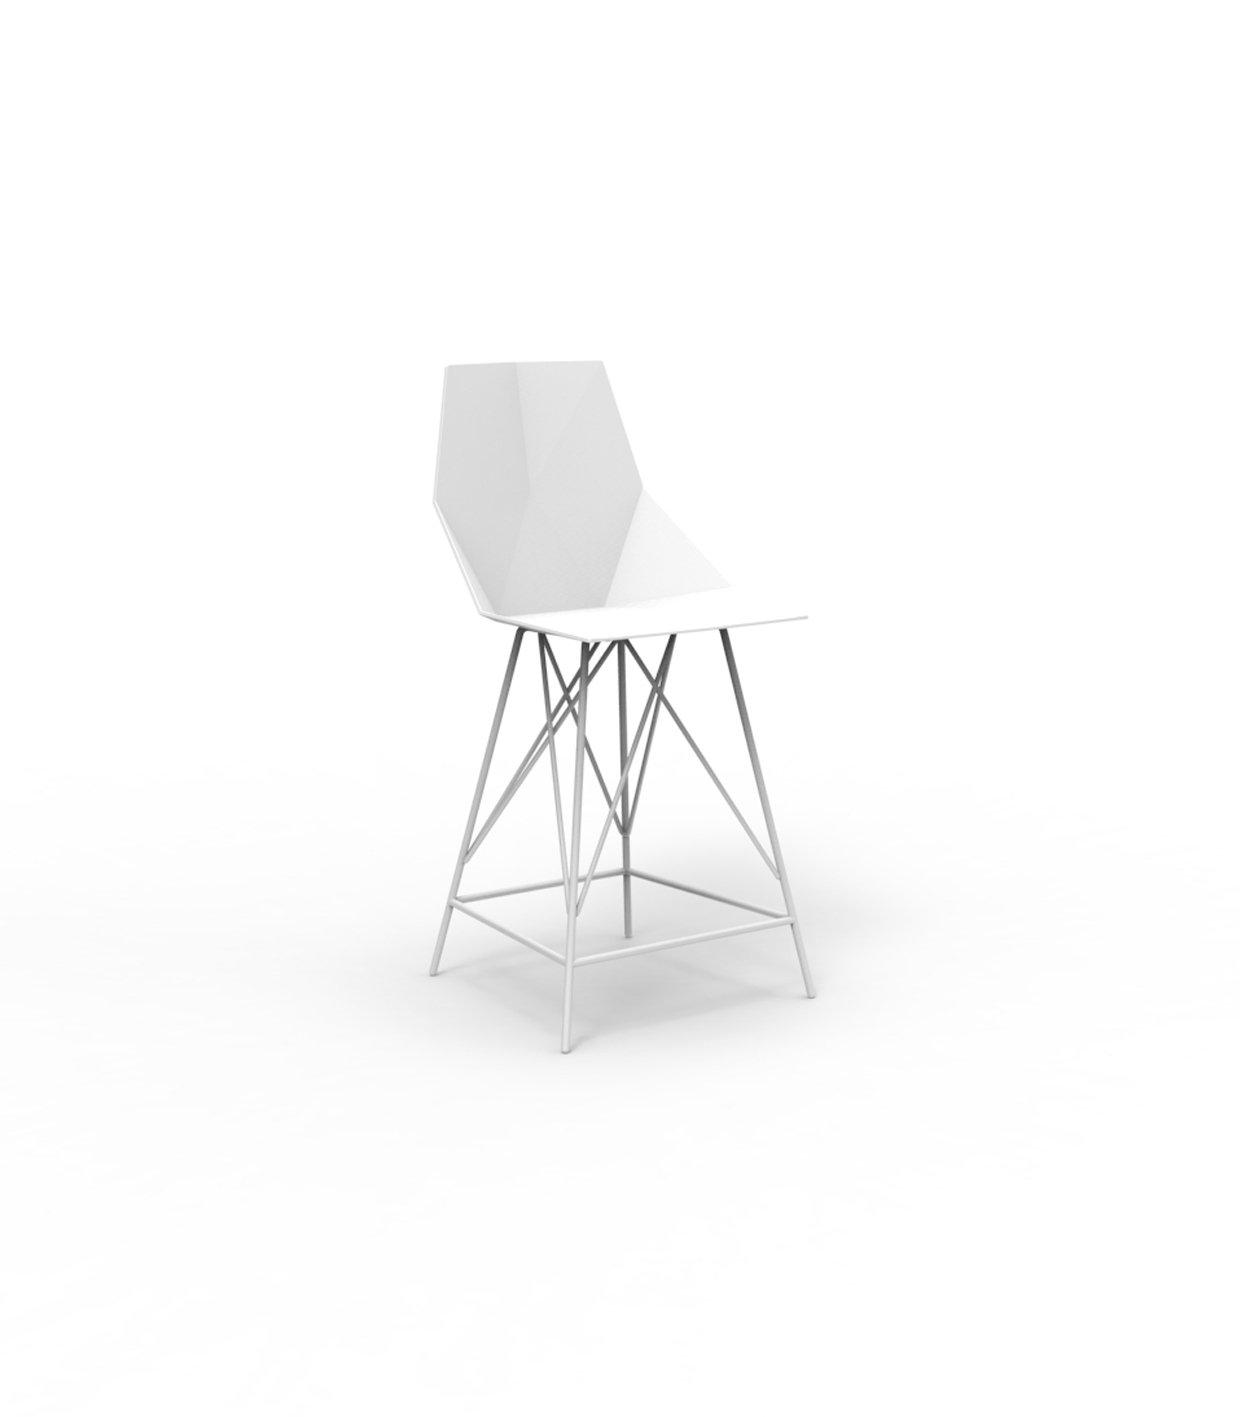 Vondom FAZ Barhocker - weiß - Höhe 102 cm - Ramón Esteve - Design - Barhocker - Gartenstuhl